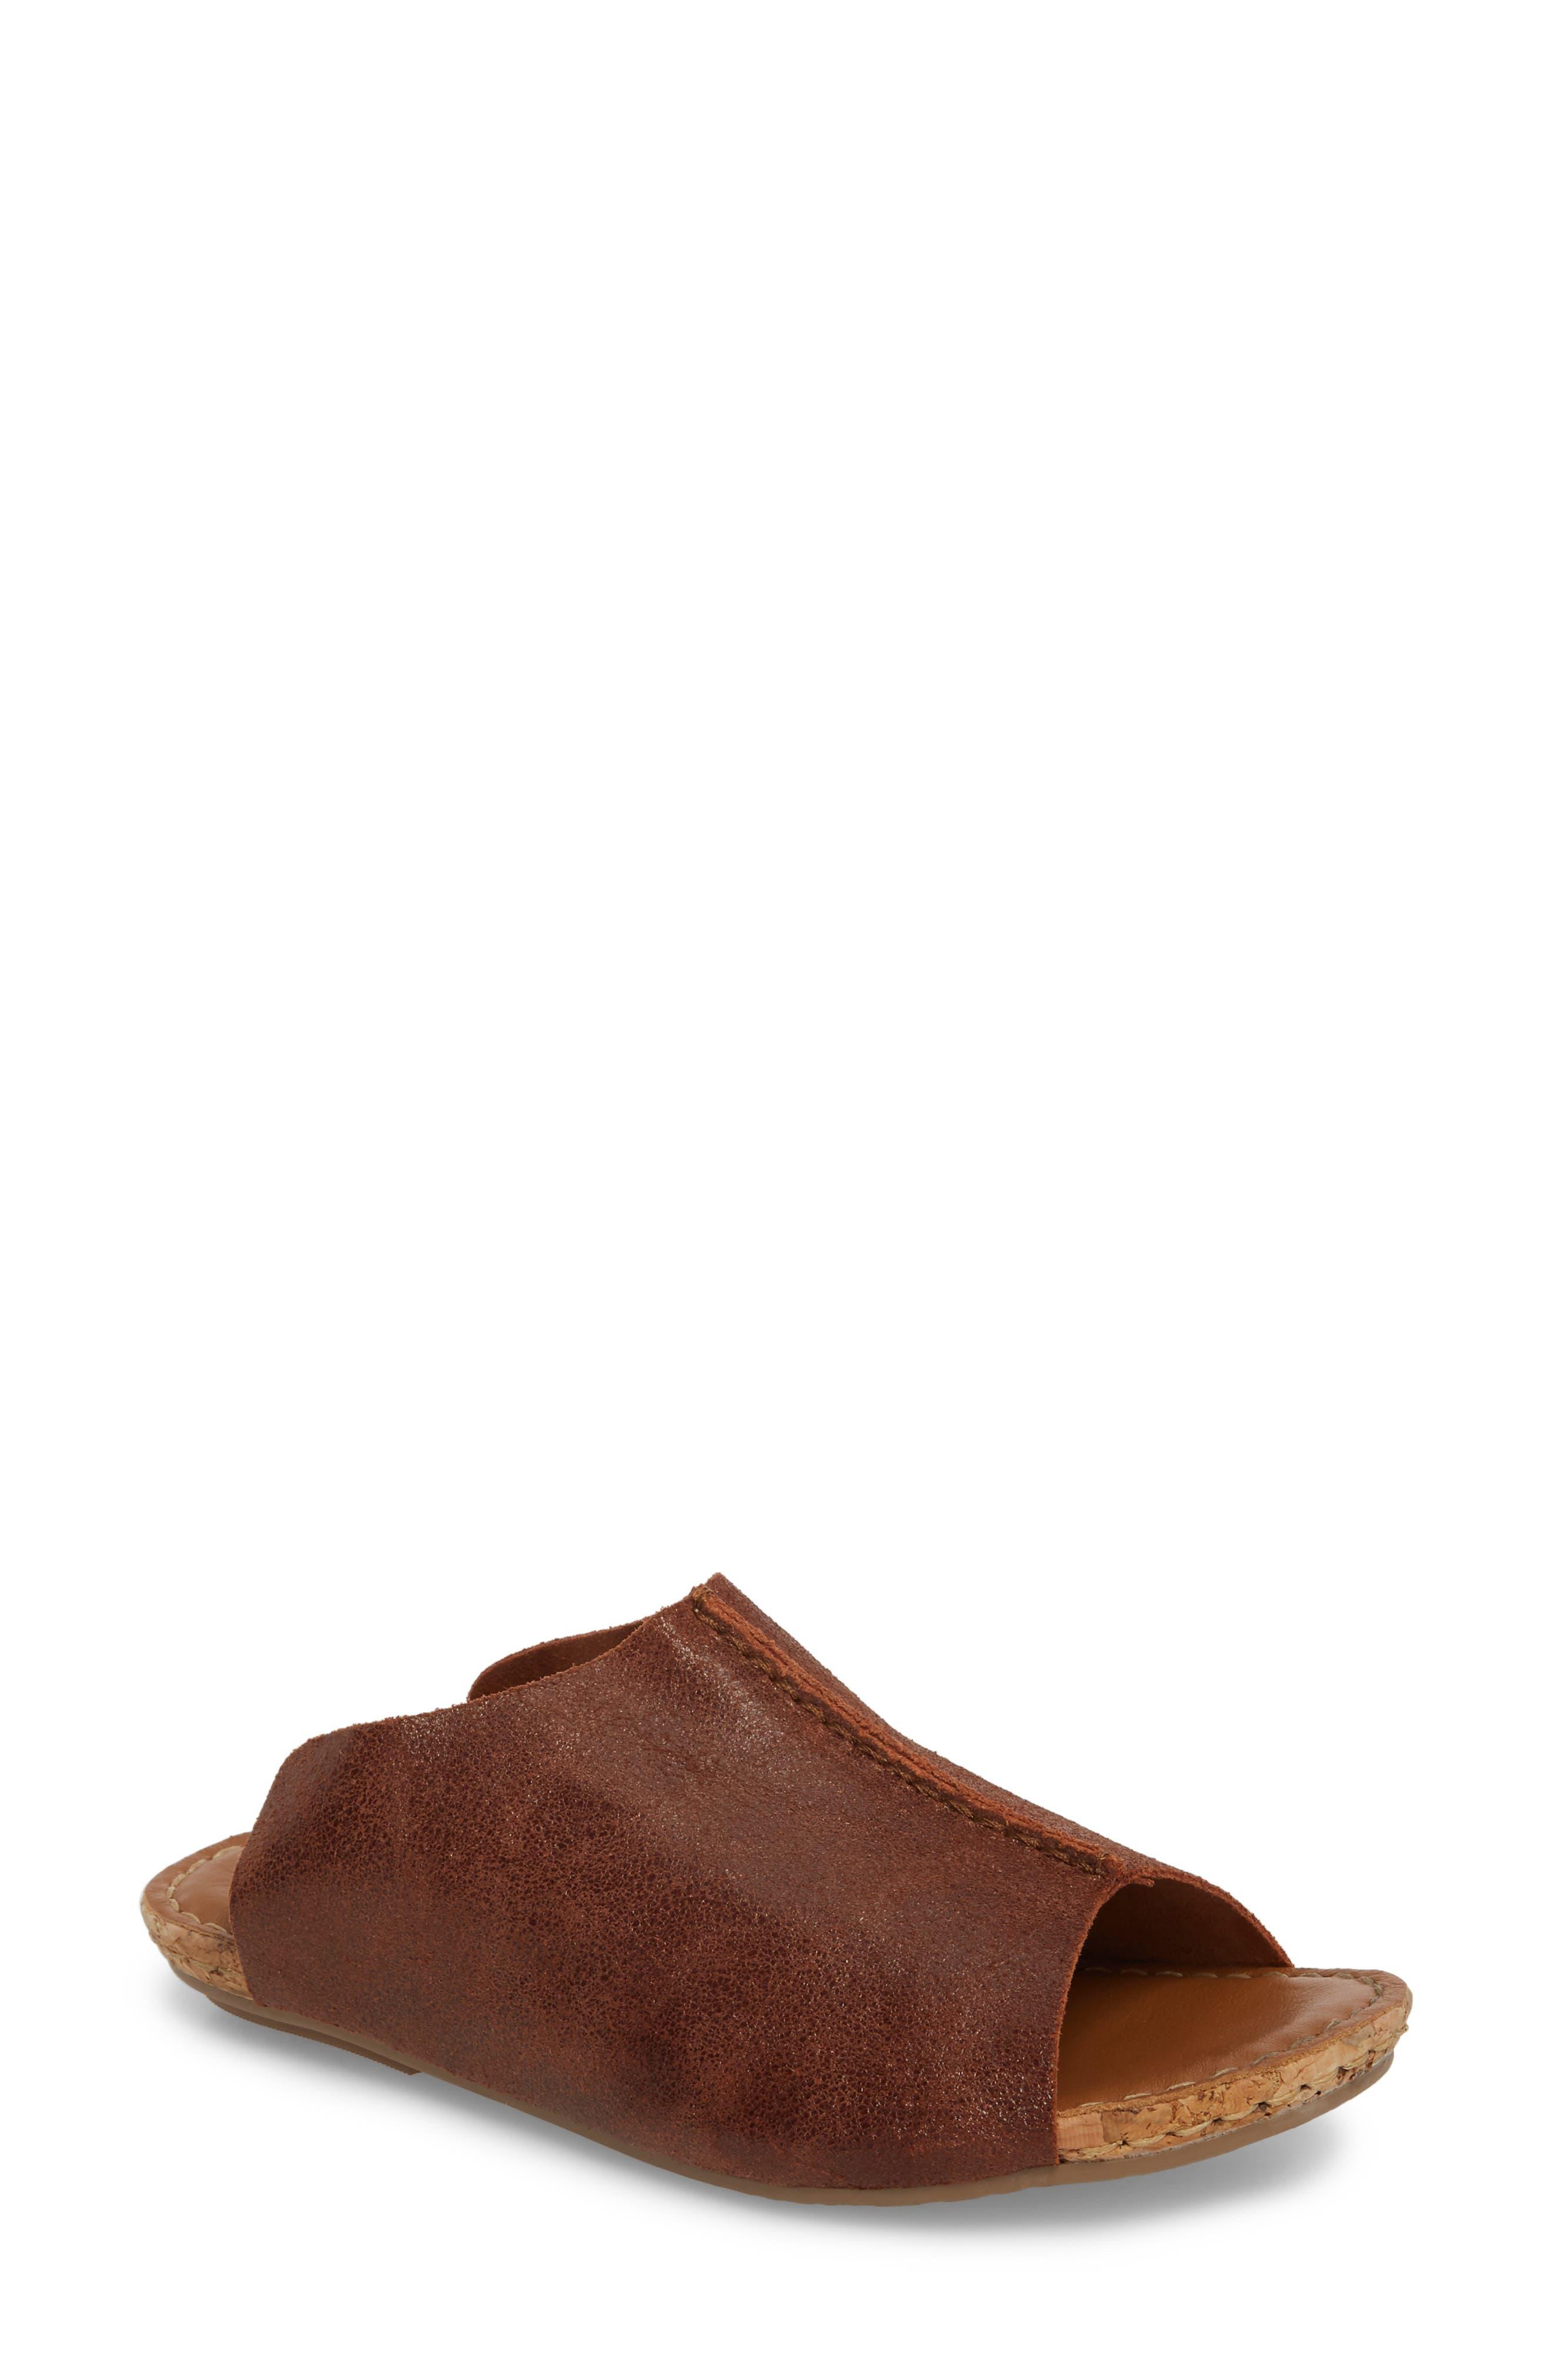 KLUB NICO, Gracey Slide Sandal, Main thumbnail 1, color, RUM LEATHER